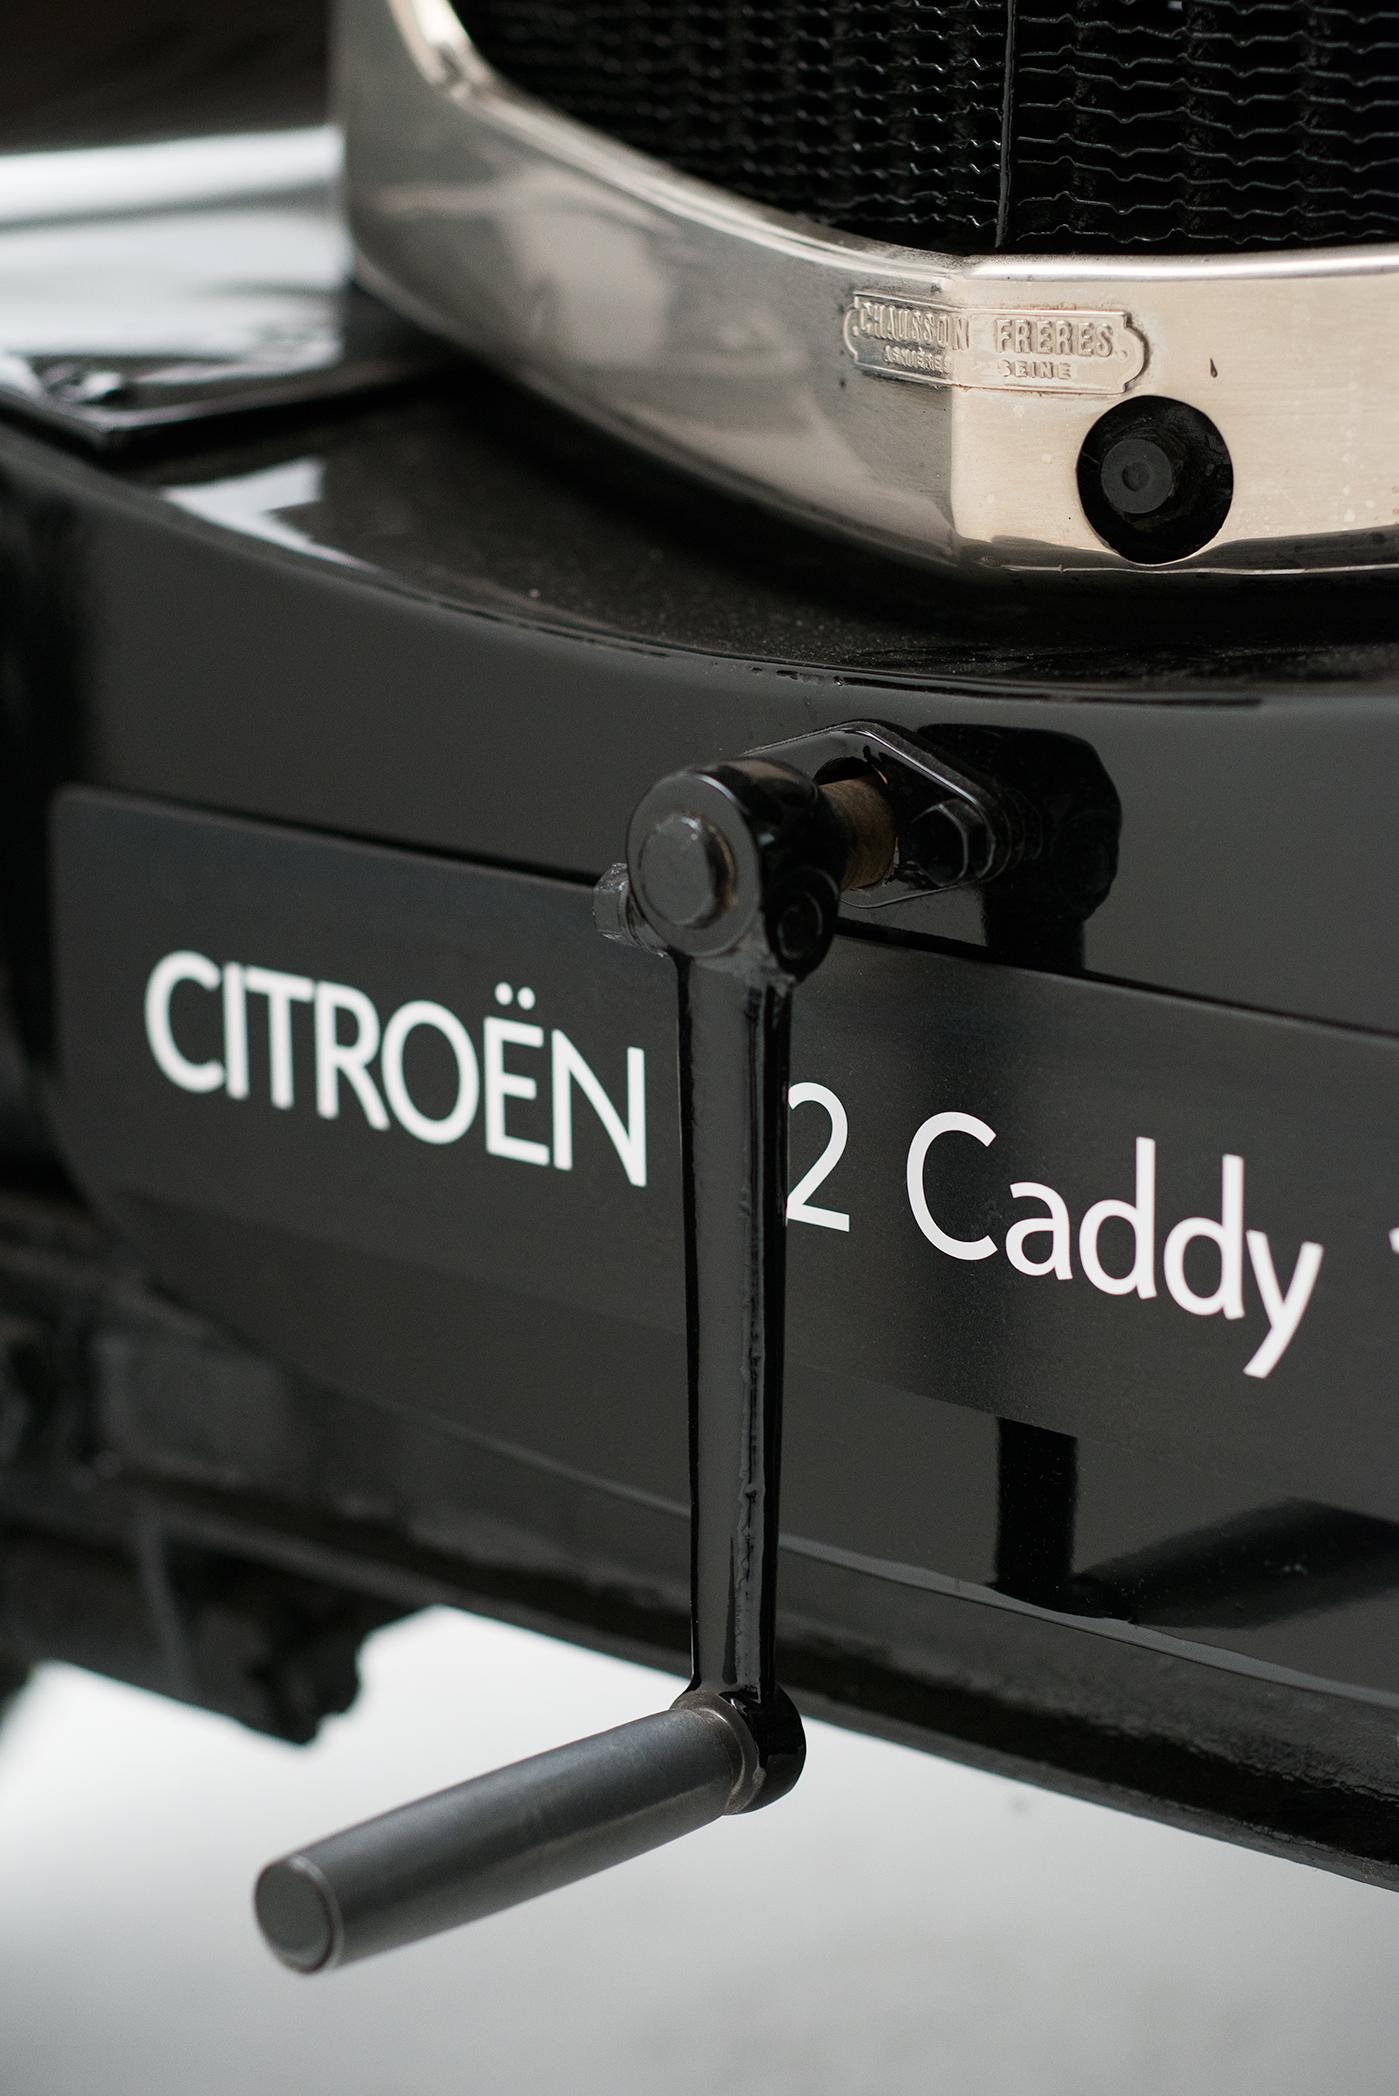 B2 Caddy - detalhe